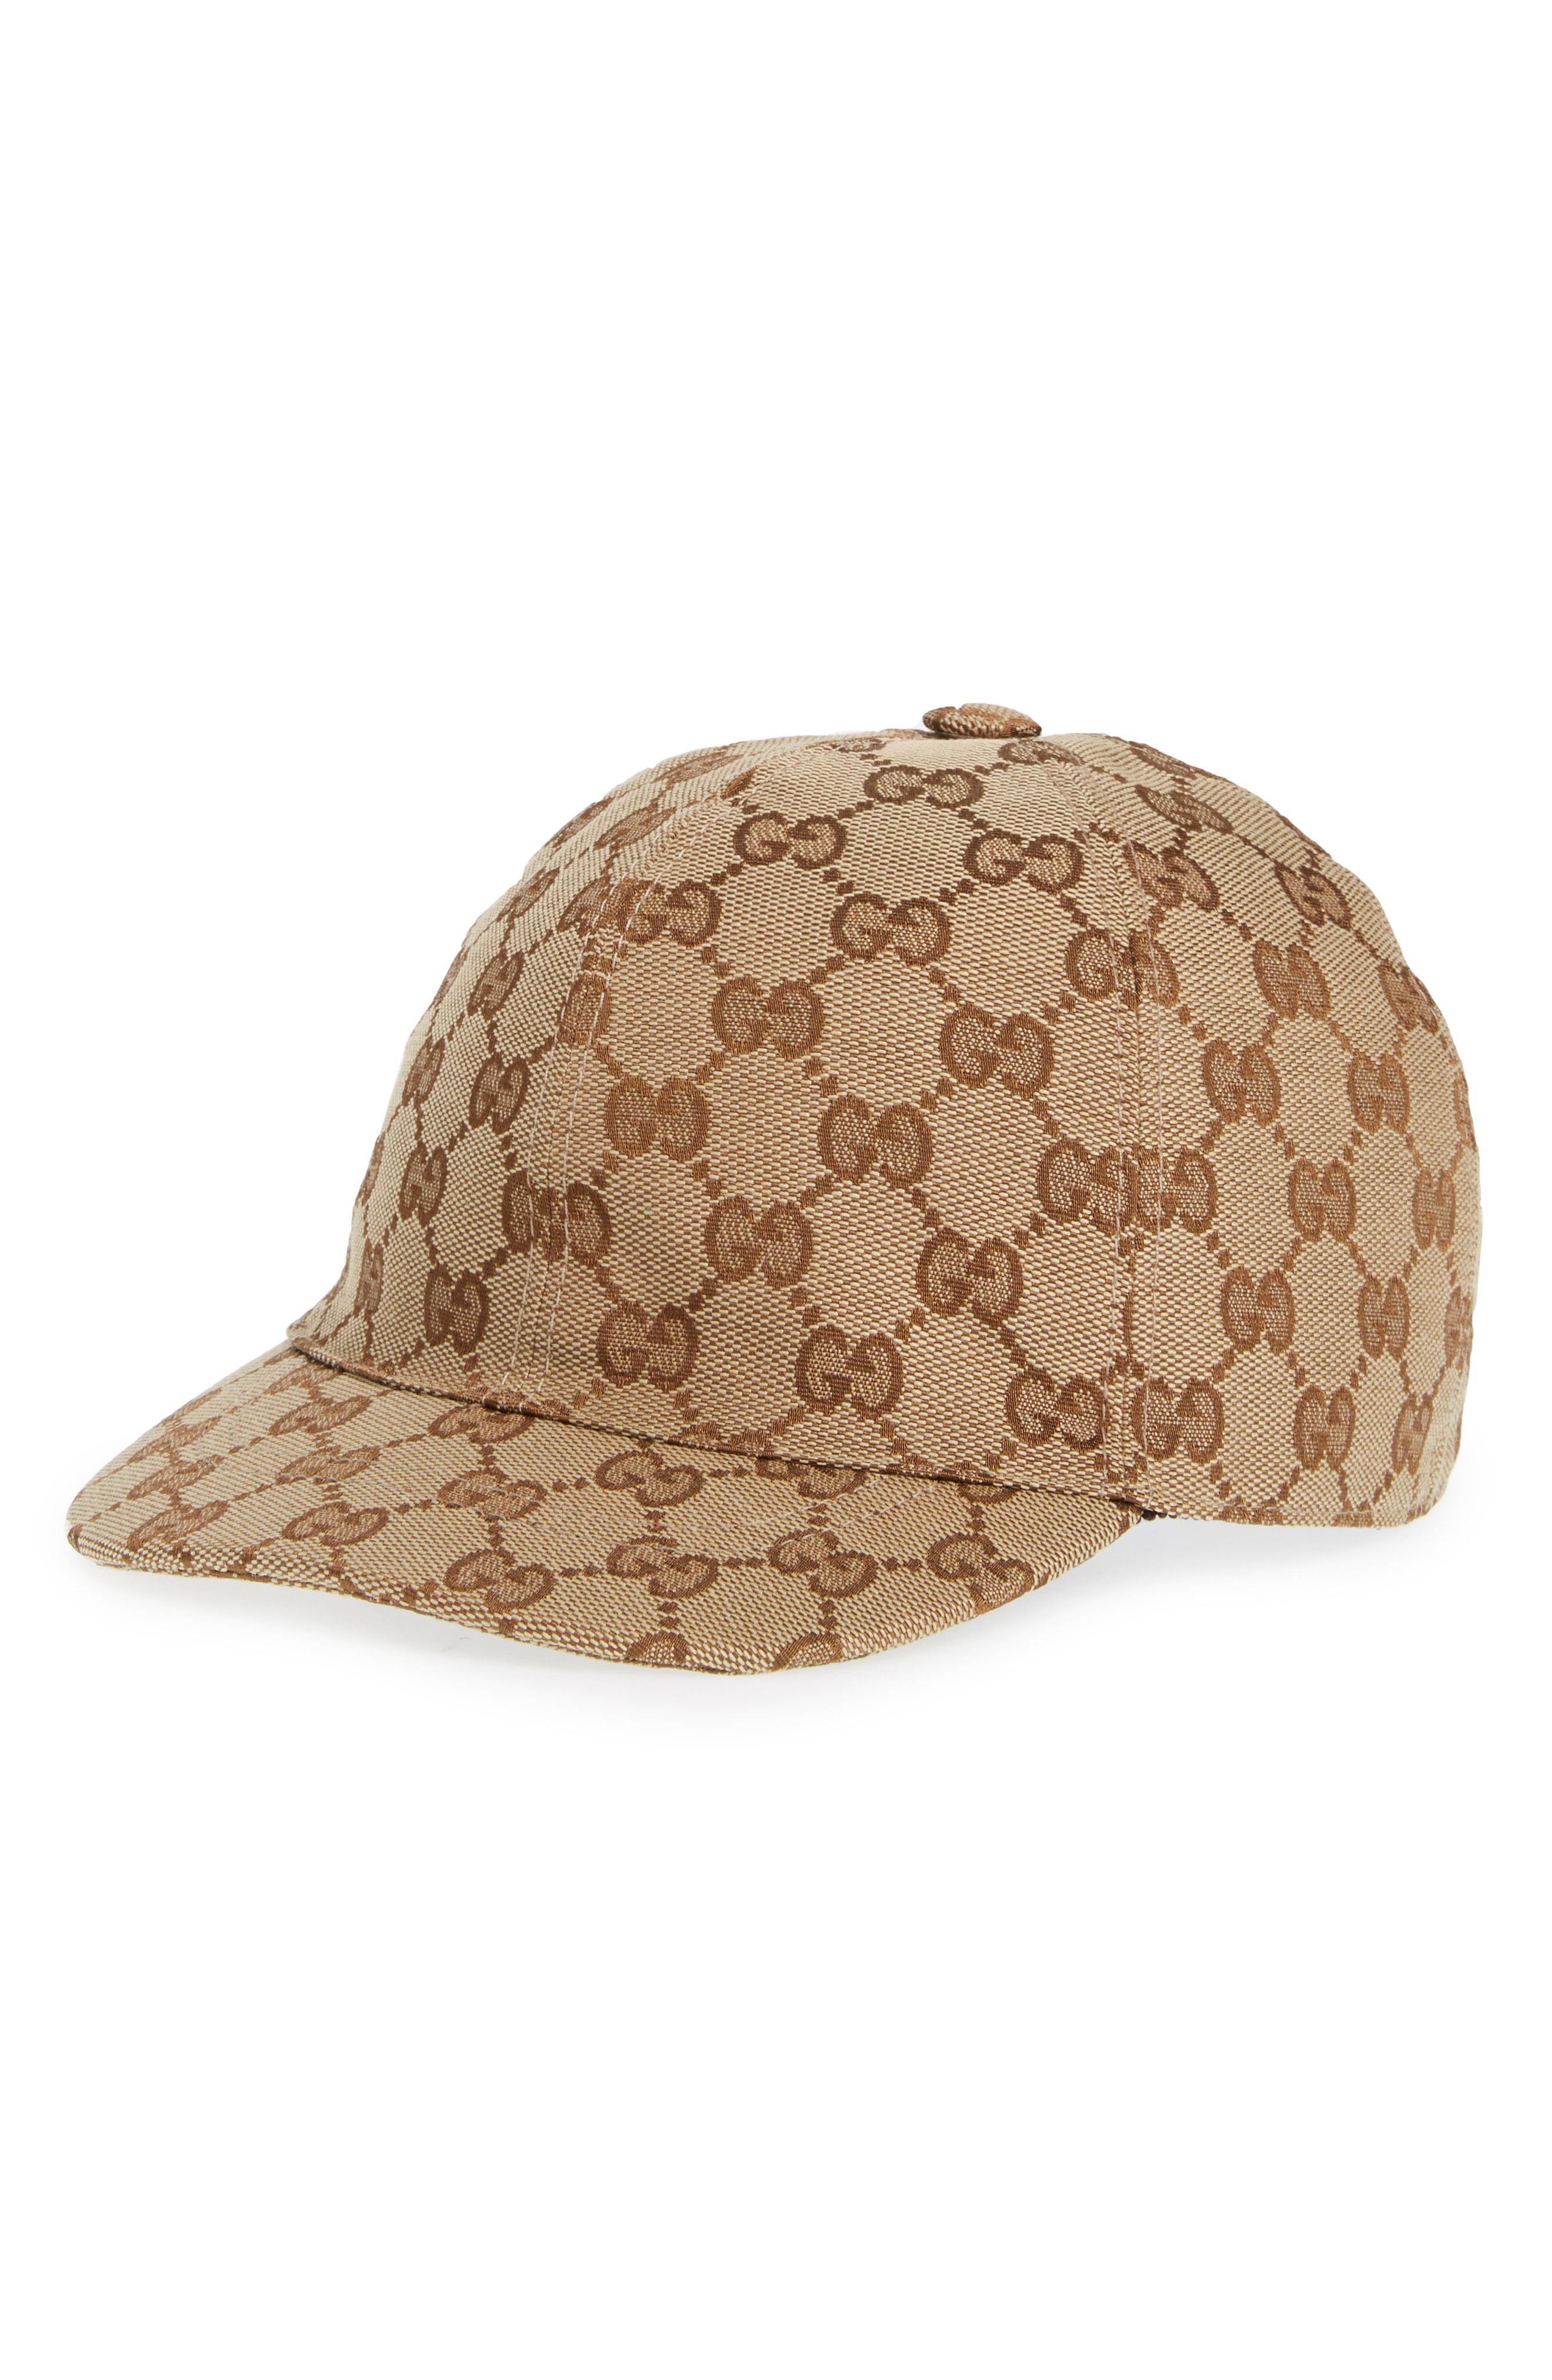 6f3542add3022 Gucci Logo Baseball Cap - in Brown for Men - Lyst